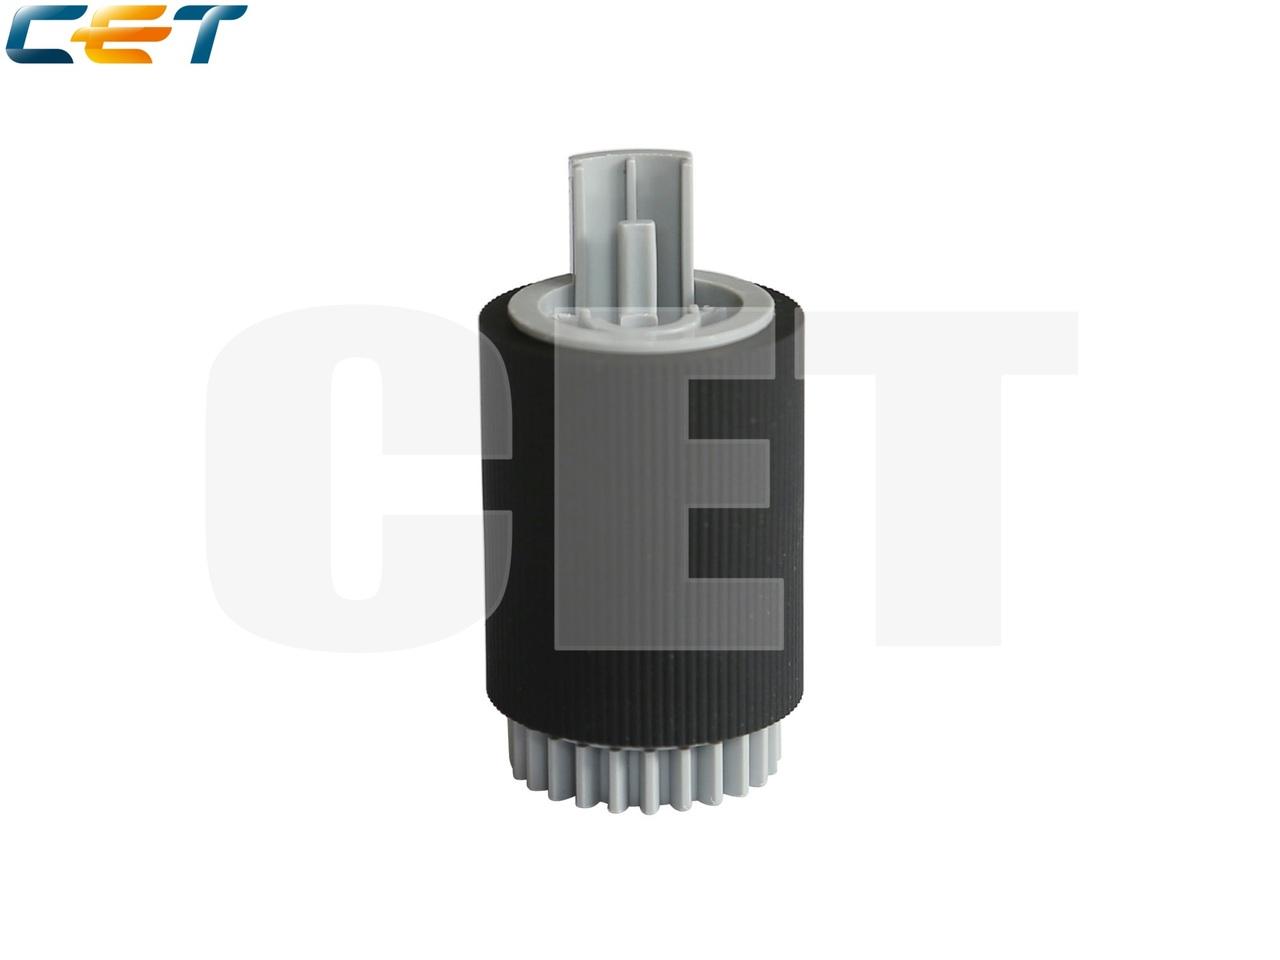 Ролик подачи (New) FC0-5080-000 для CANON iR ADVANCE4025/4035/4045/4051/4225/4235/4245/4251 (CET), CET5230